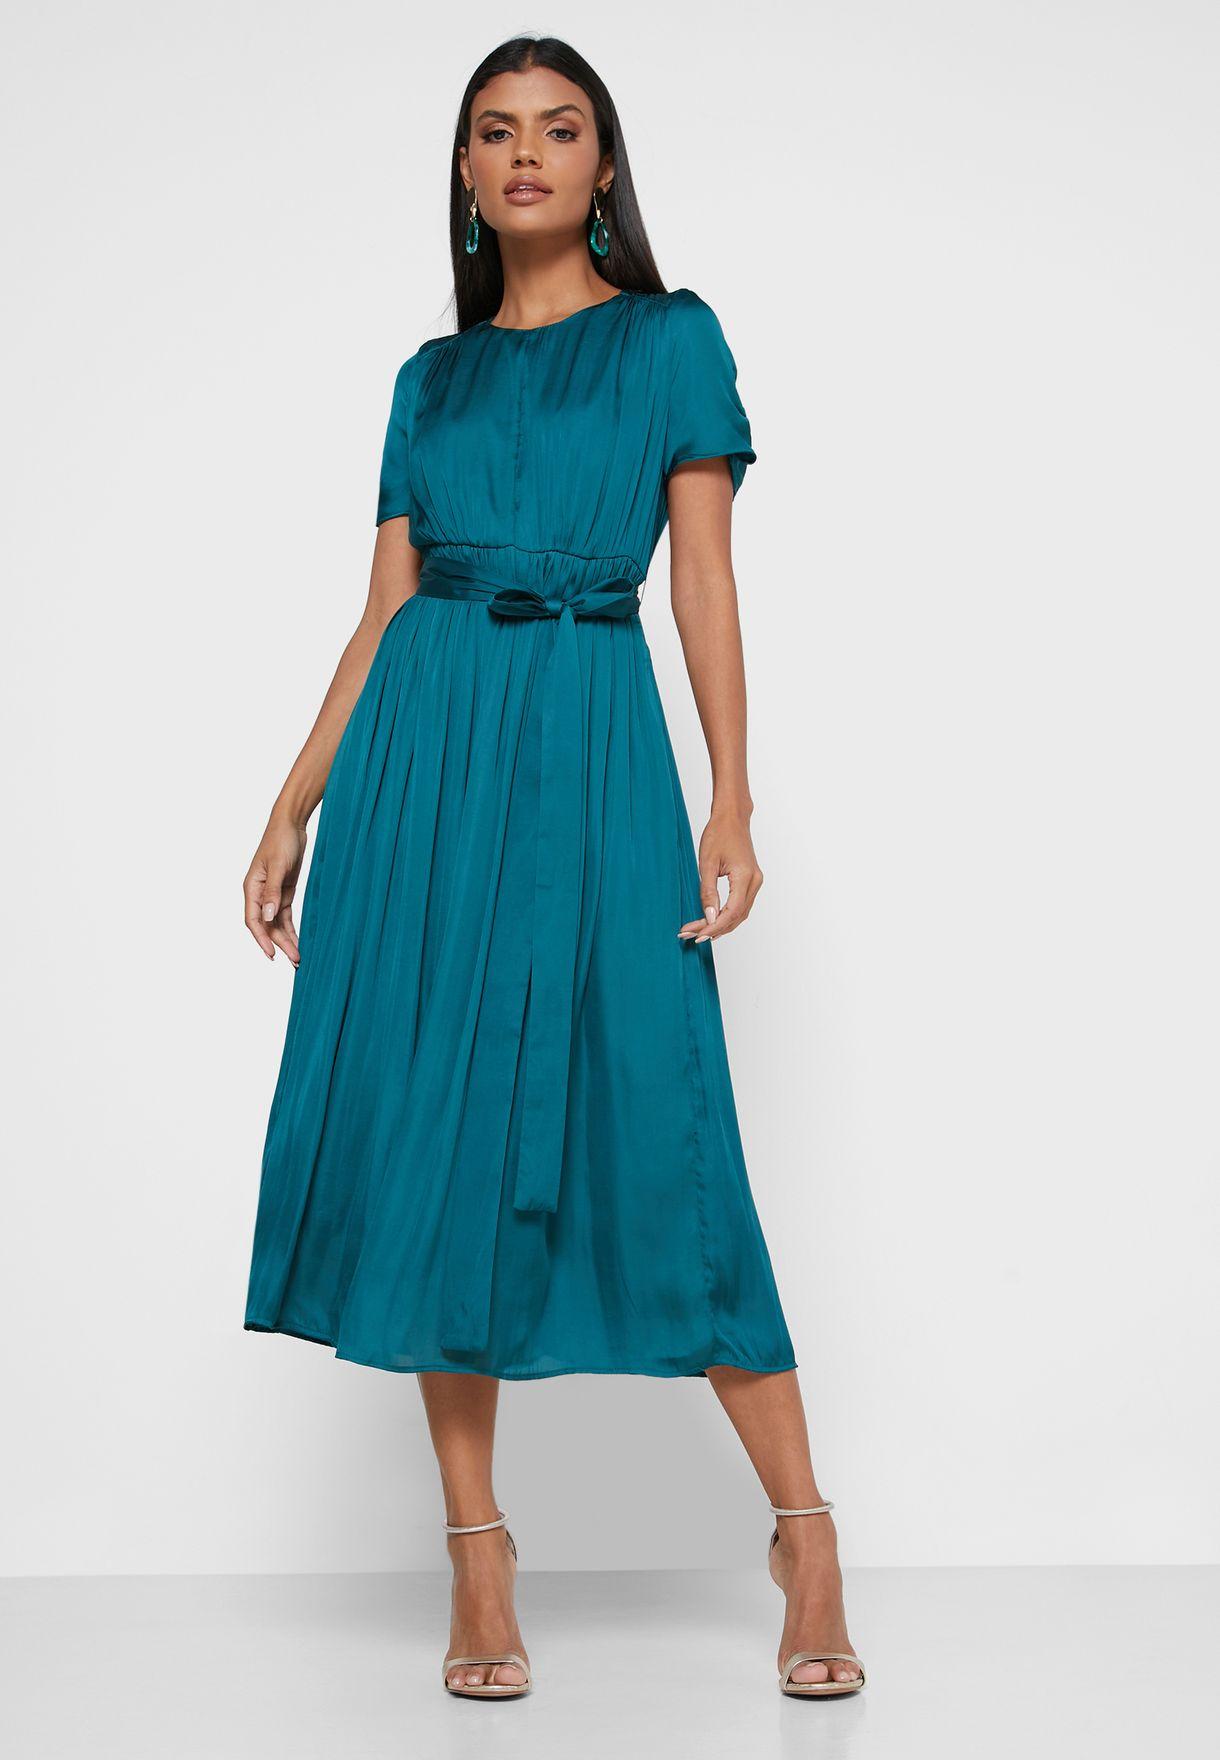 فستان بخصر امباير وكسرات